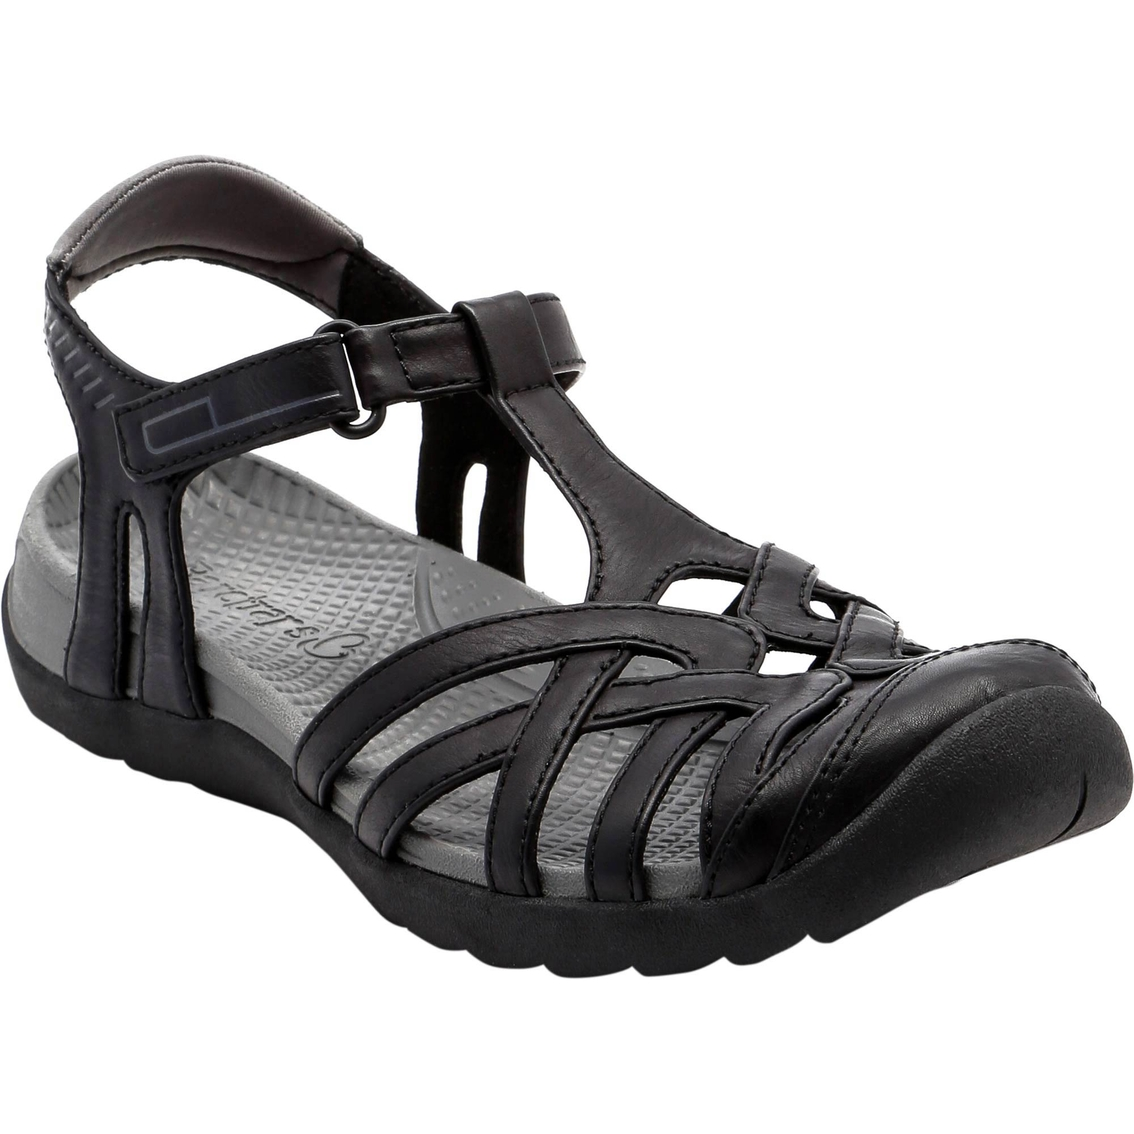 Women's Sport Sandals | Women's Hiking Sandals | Women's Athletic ...